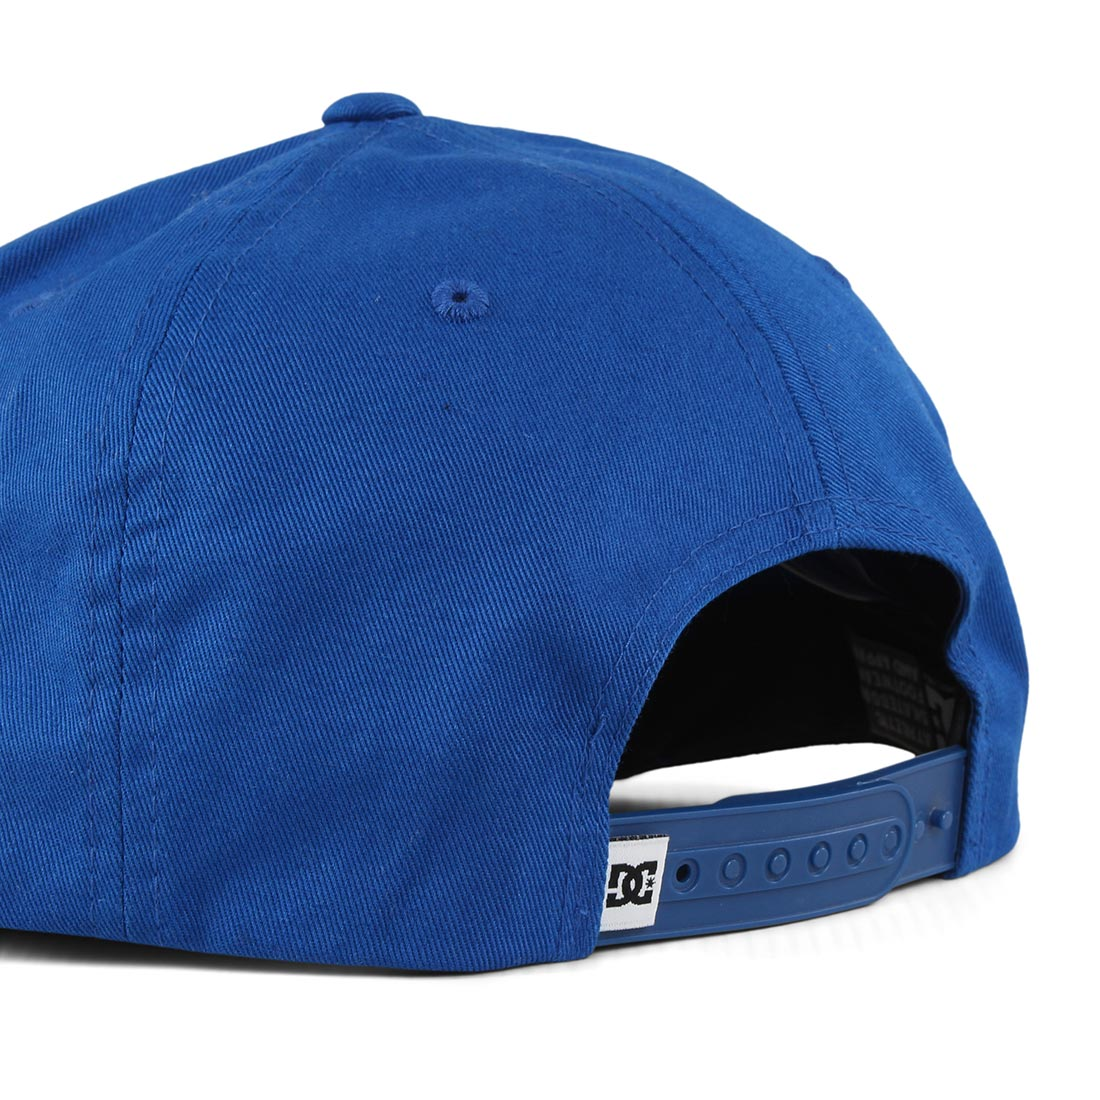 DC Shoes Snapdoodle Snapback Cap - Sodalite Blue